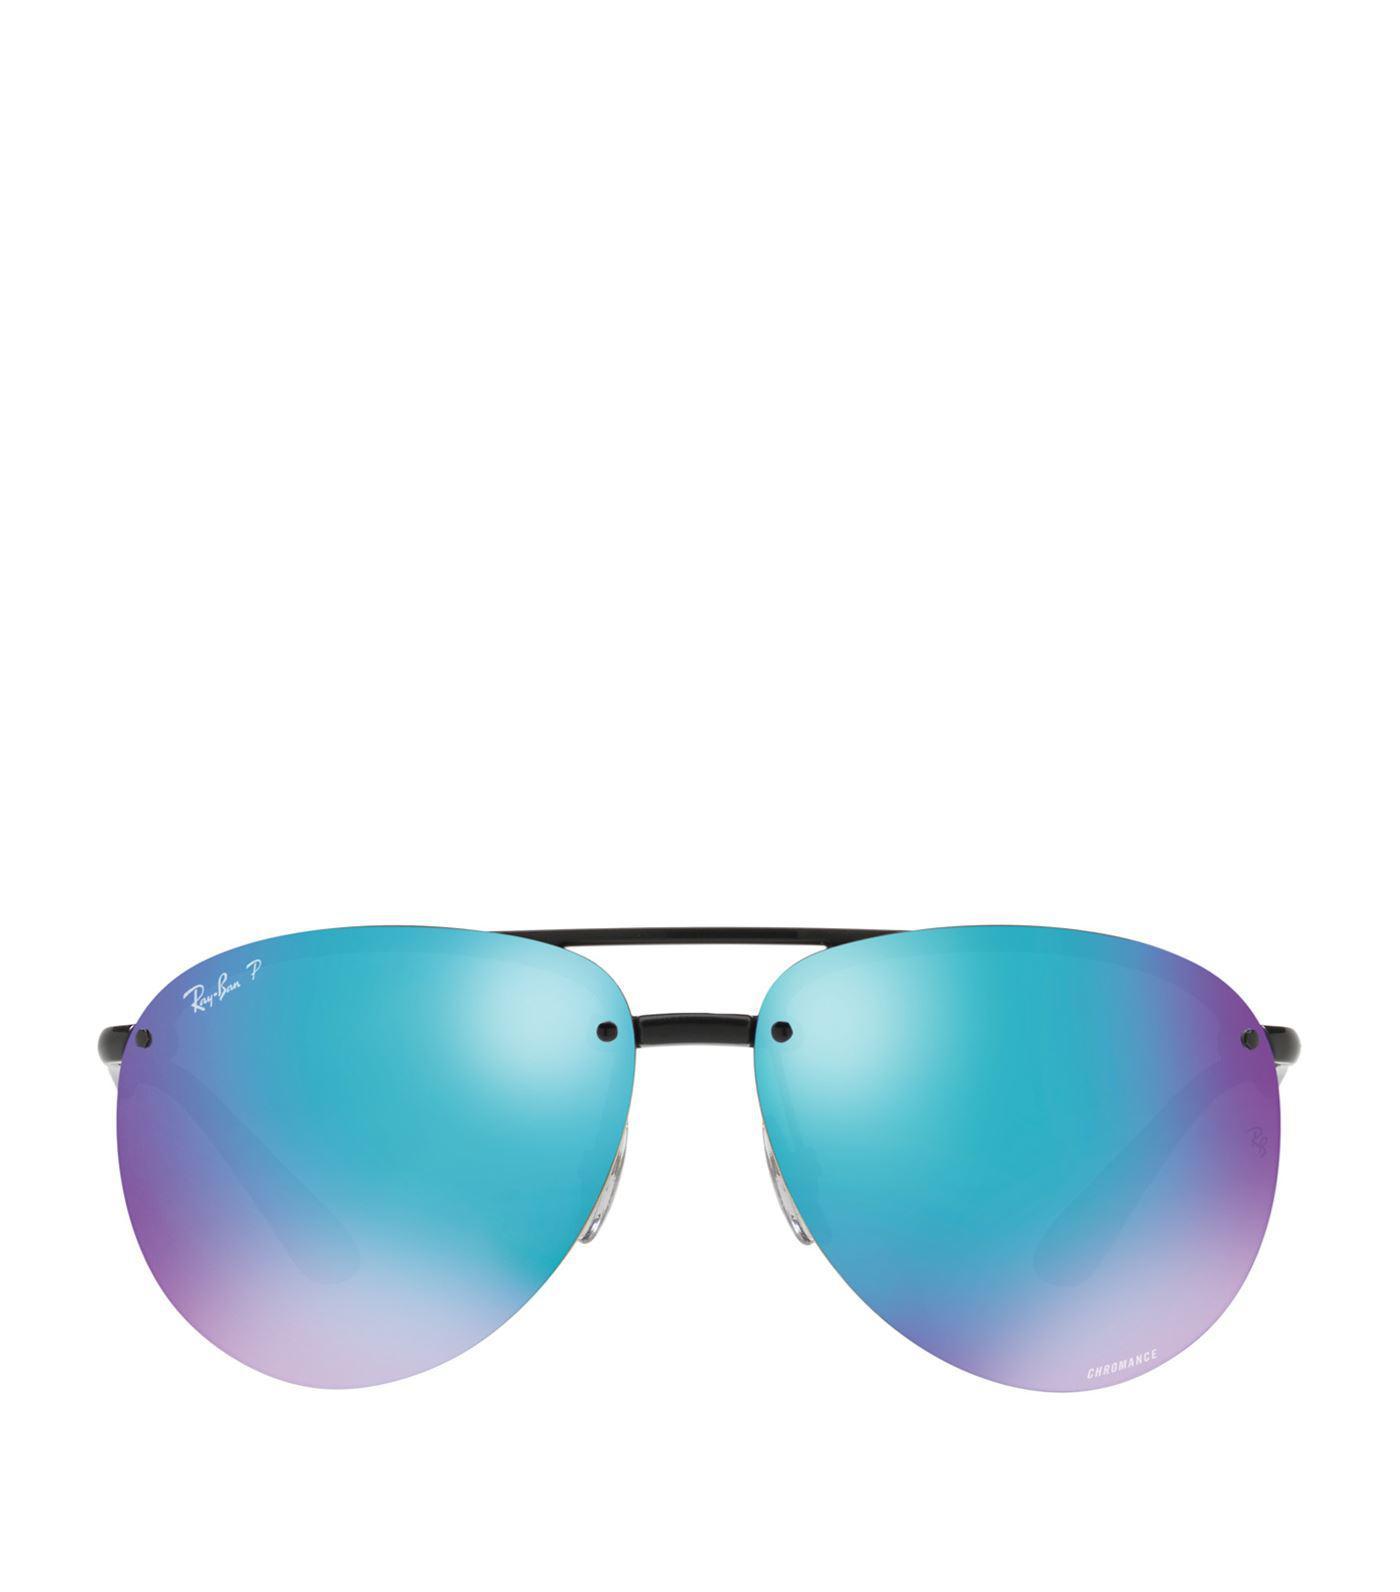 585ea985da Ray-Ban Polarised Mirror Aviator Sunglasses in Black - Lyst